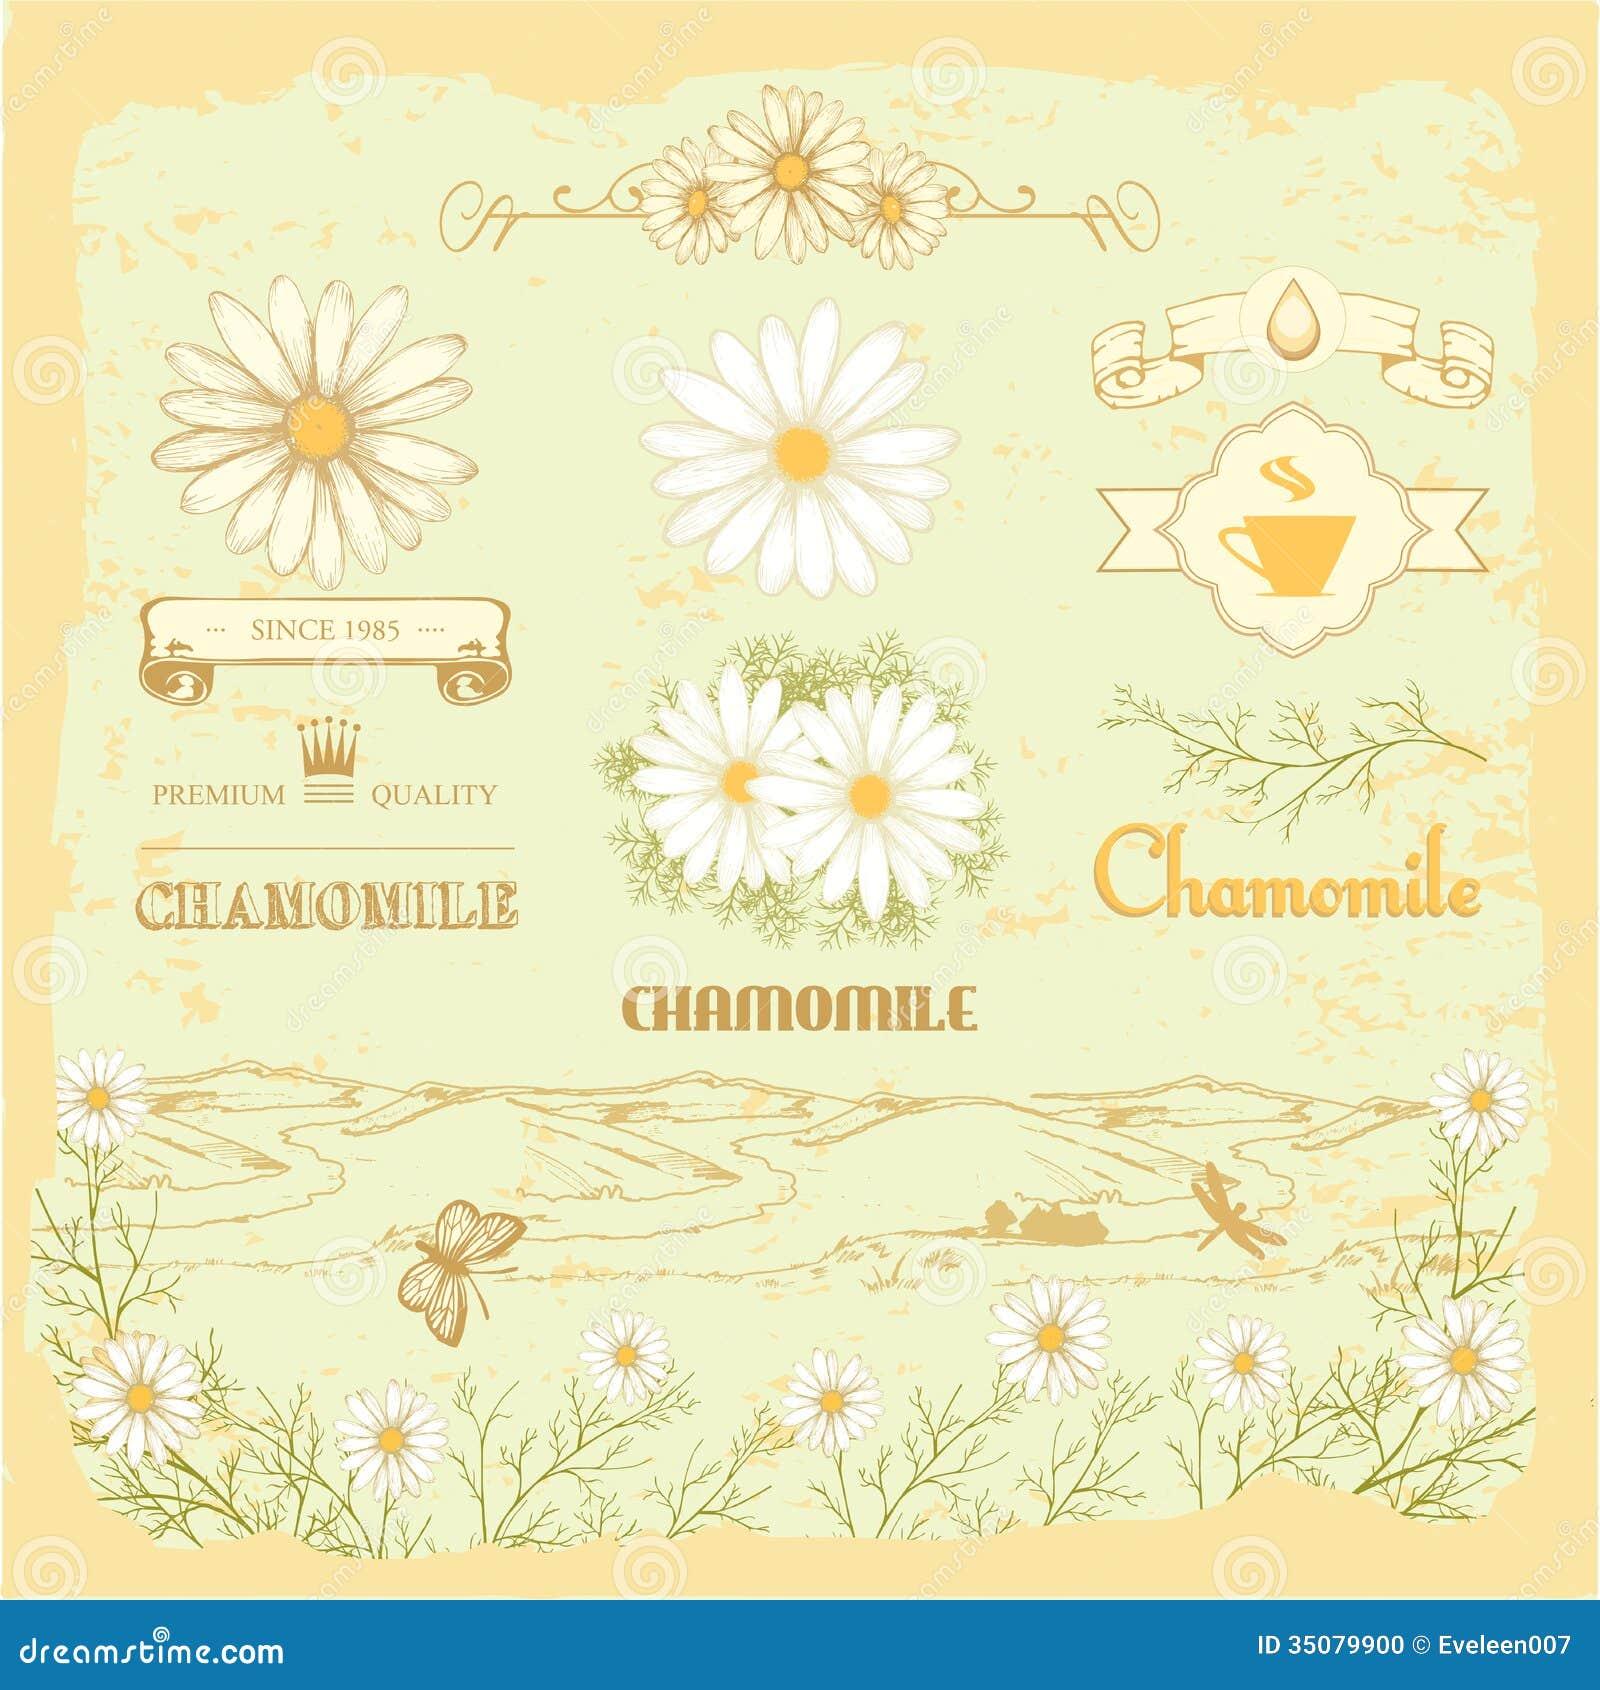 Vintage Flower Diagram Schematic Diagrams Botanical Tree Ring Vintageprintable Chamomile Stock Vector Illustration Of Morphology 35079900 Light